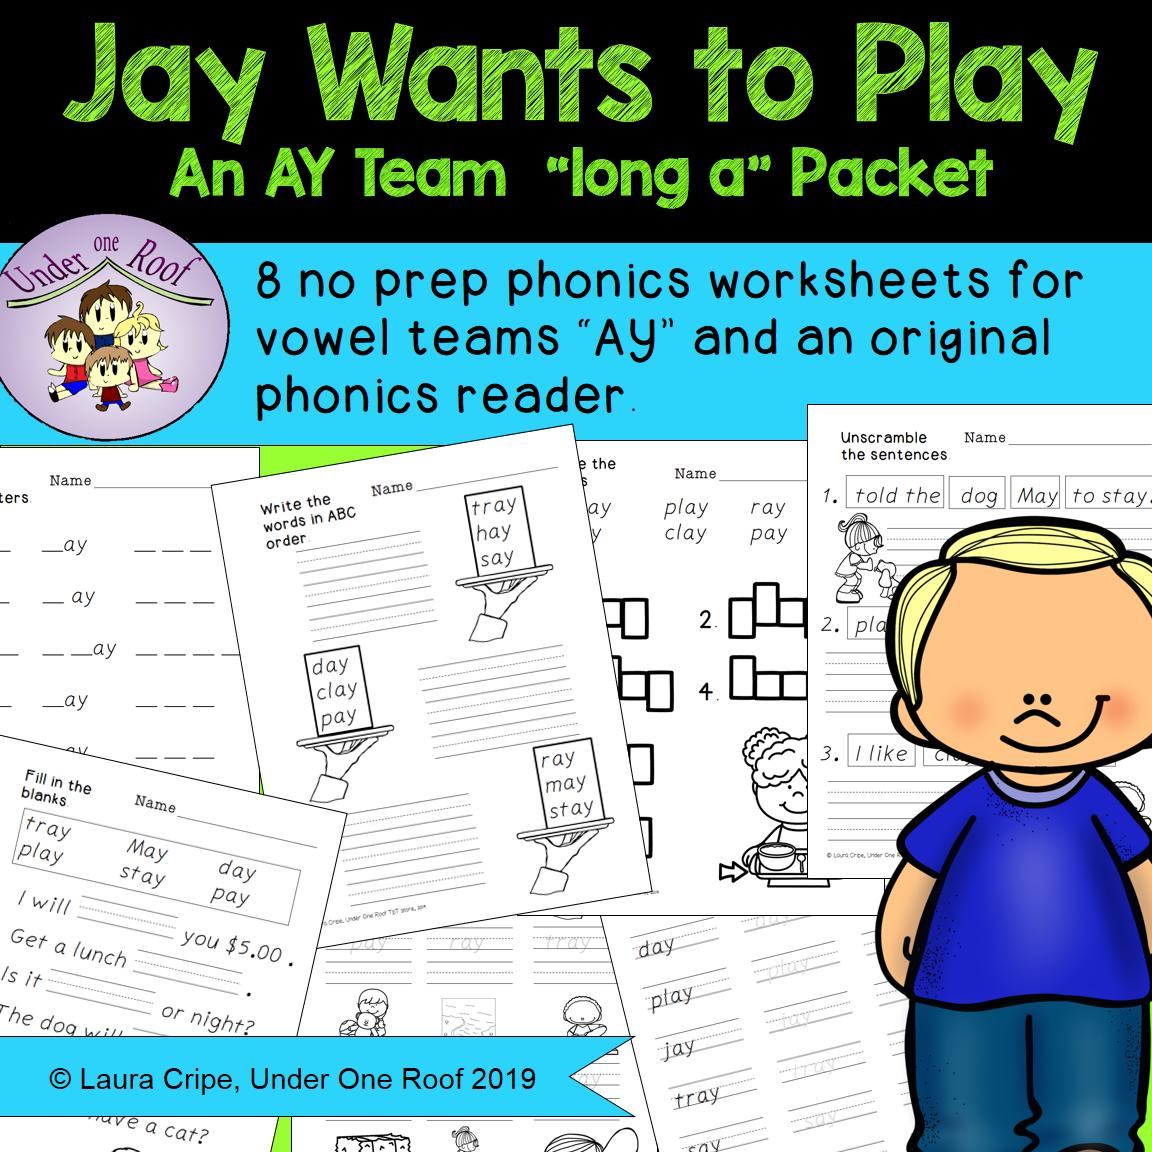 Jay Wants To Play An Ay Team Phonics Packet